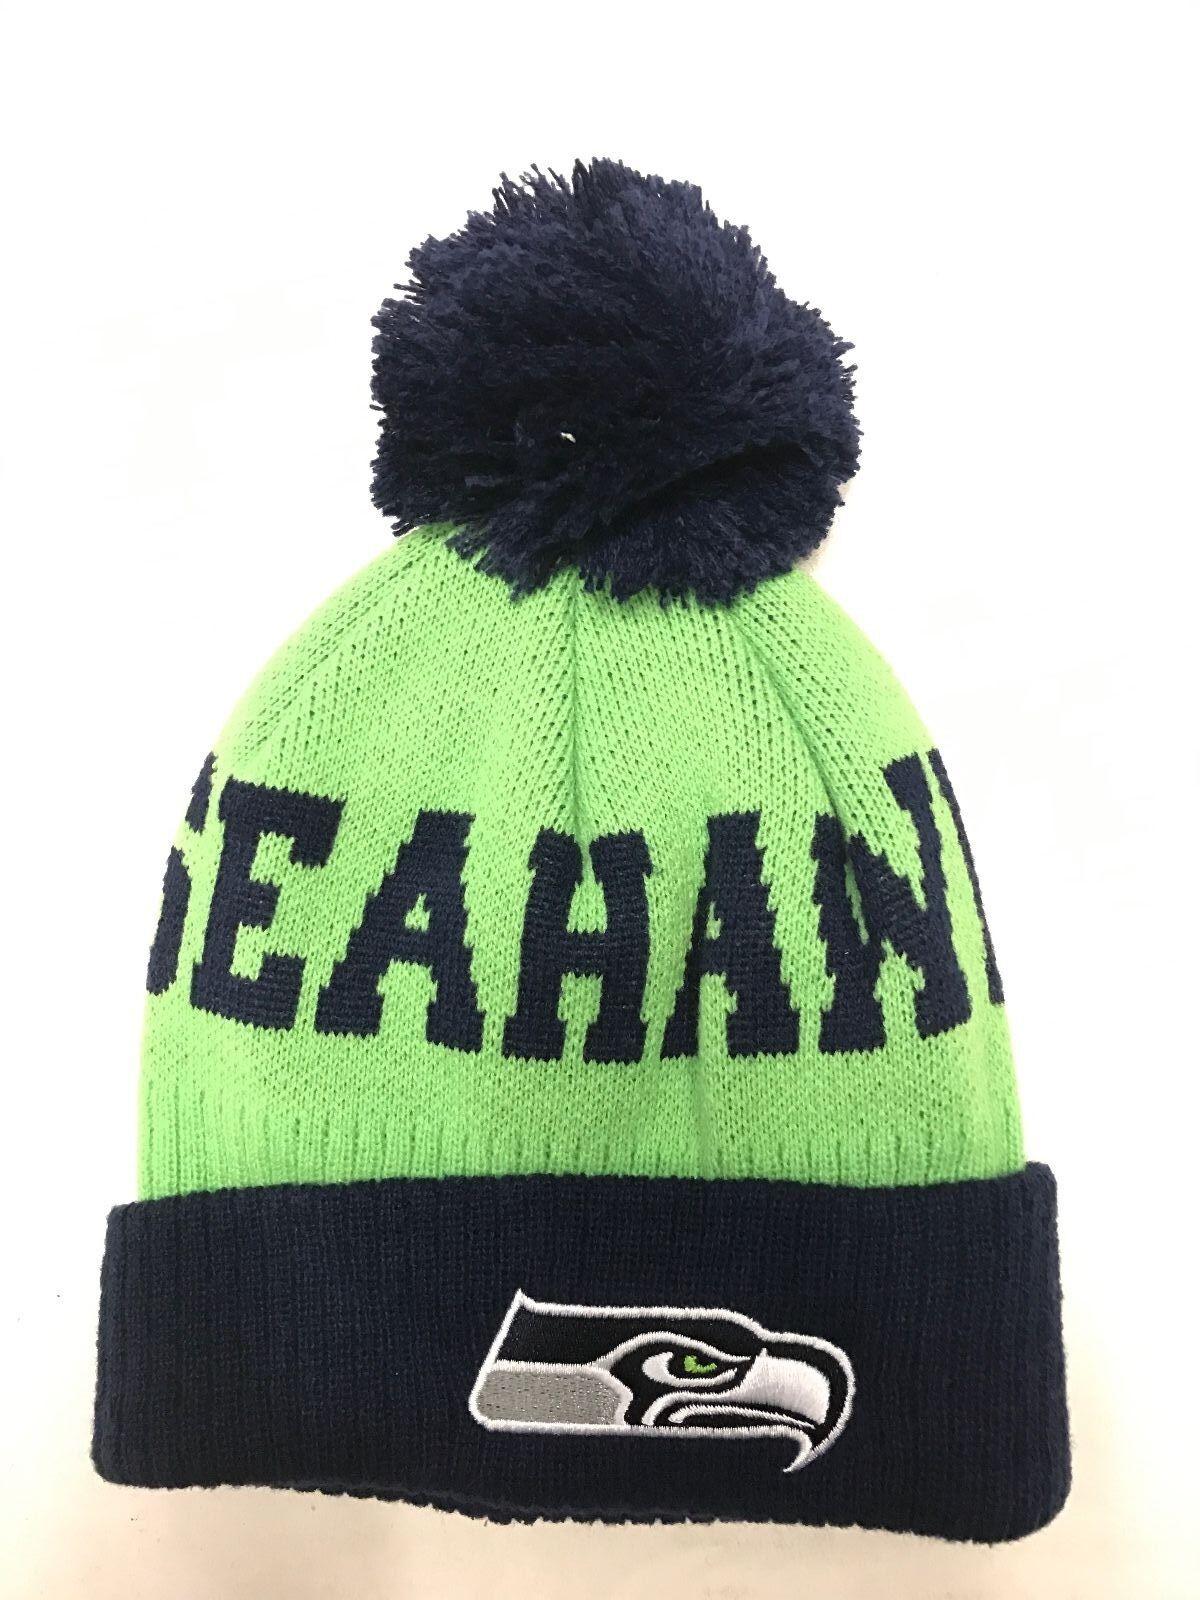 NFL Newborn/Infant/Toddler Seattle Seahawks Team Colors Cuff